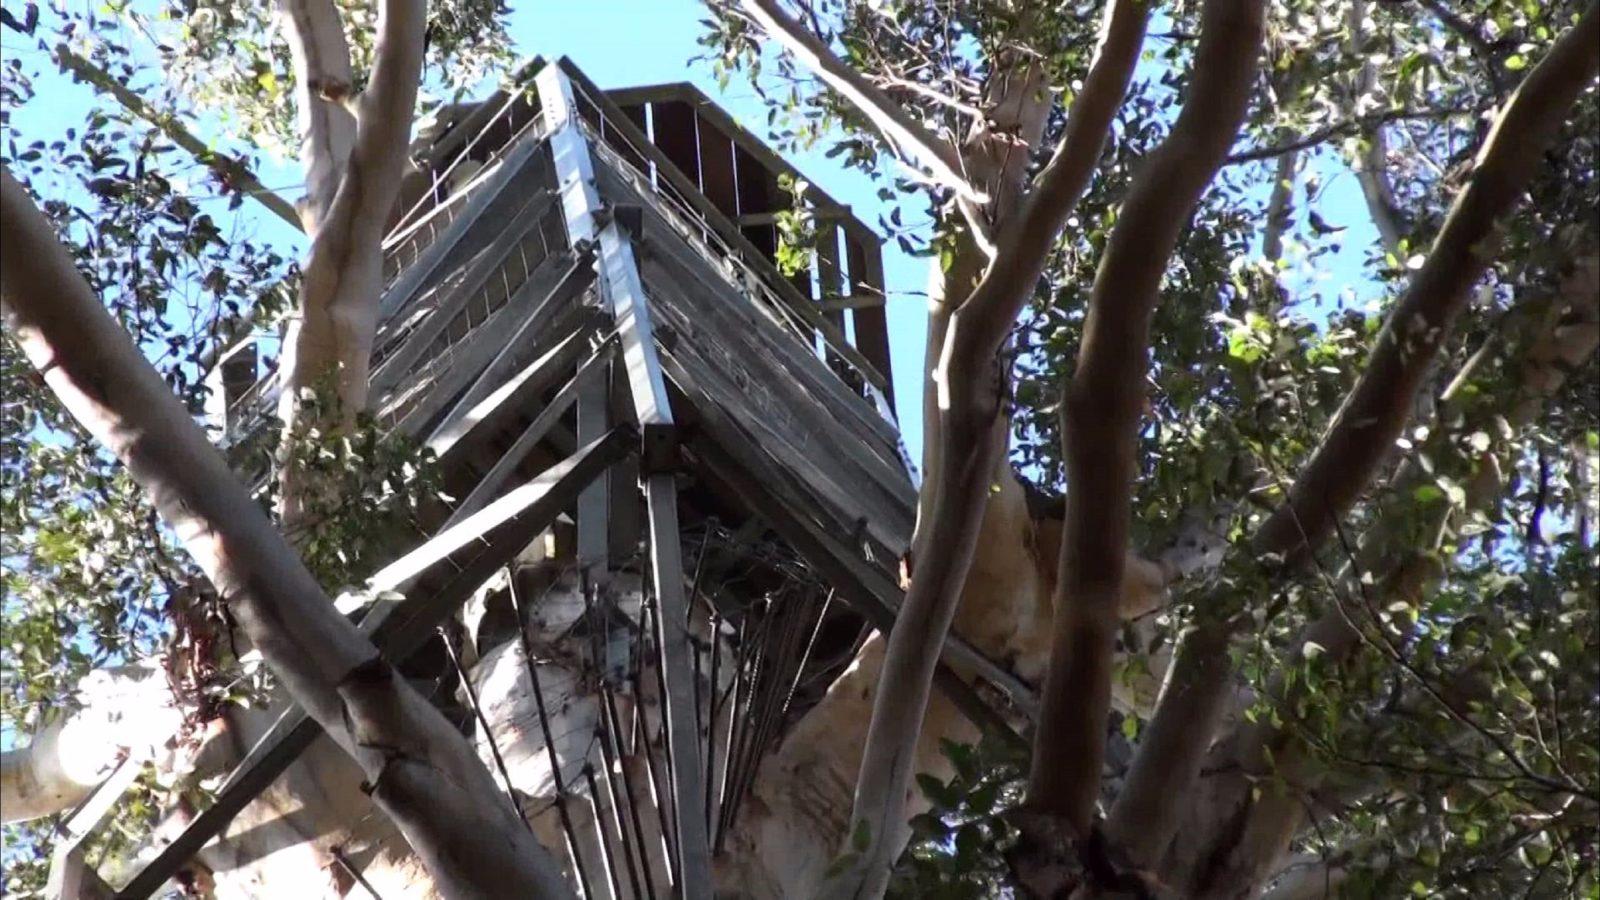 Gloucester Tree, Pemberton, Western Australia